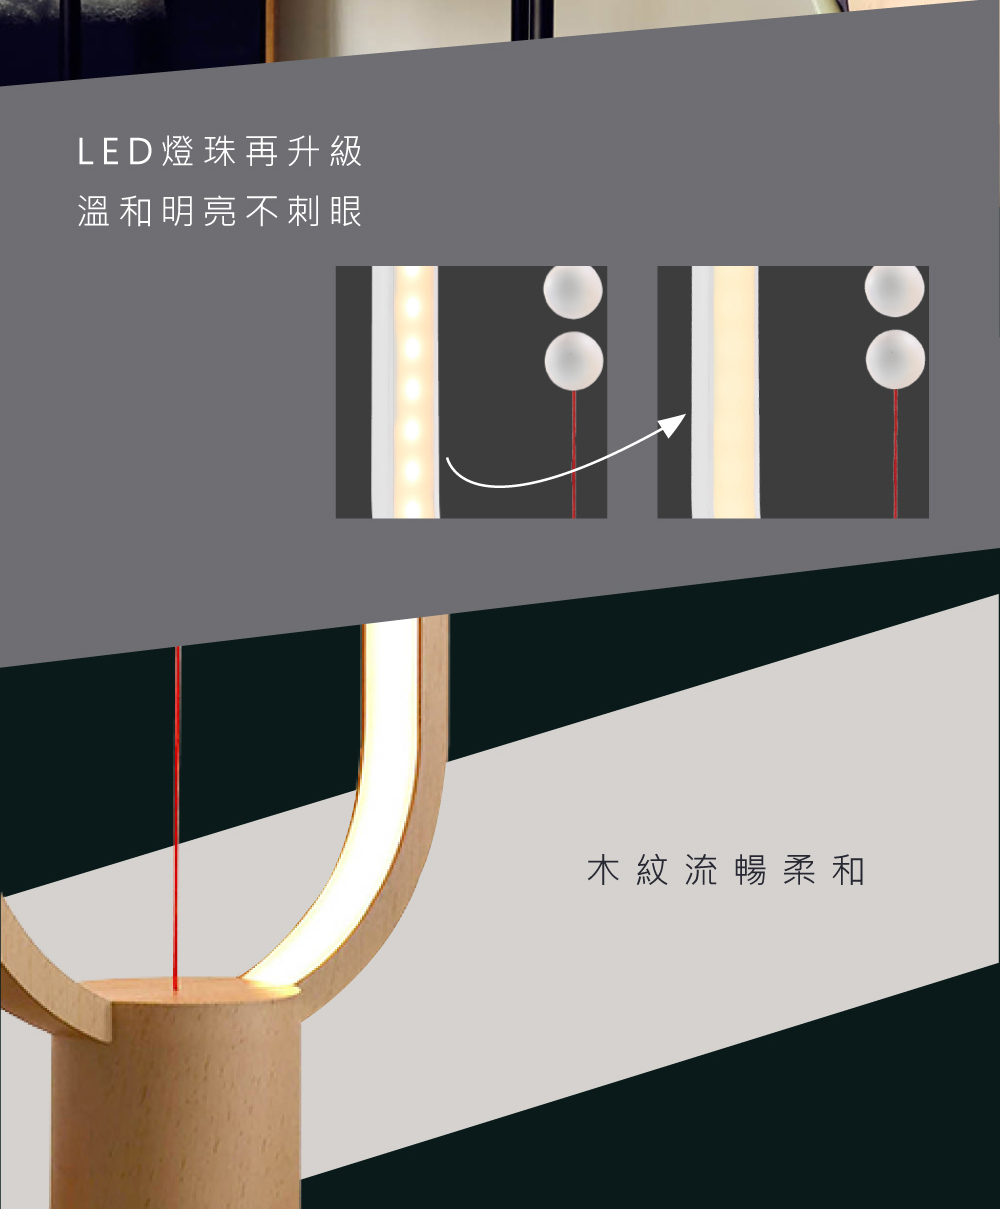 ZAN DESIGN - Heng PRO 衡燈2.0 橢圓 (烤漆款 - 木紋)